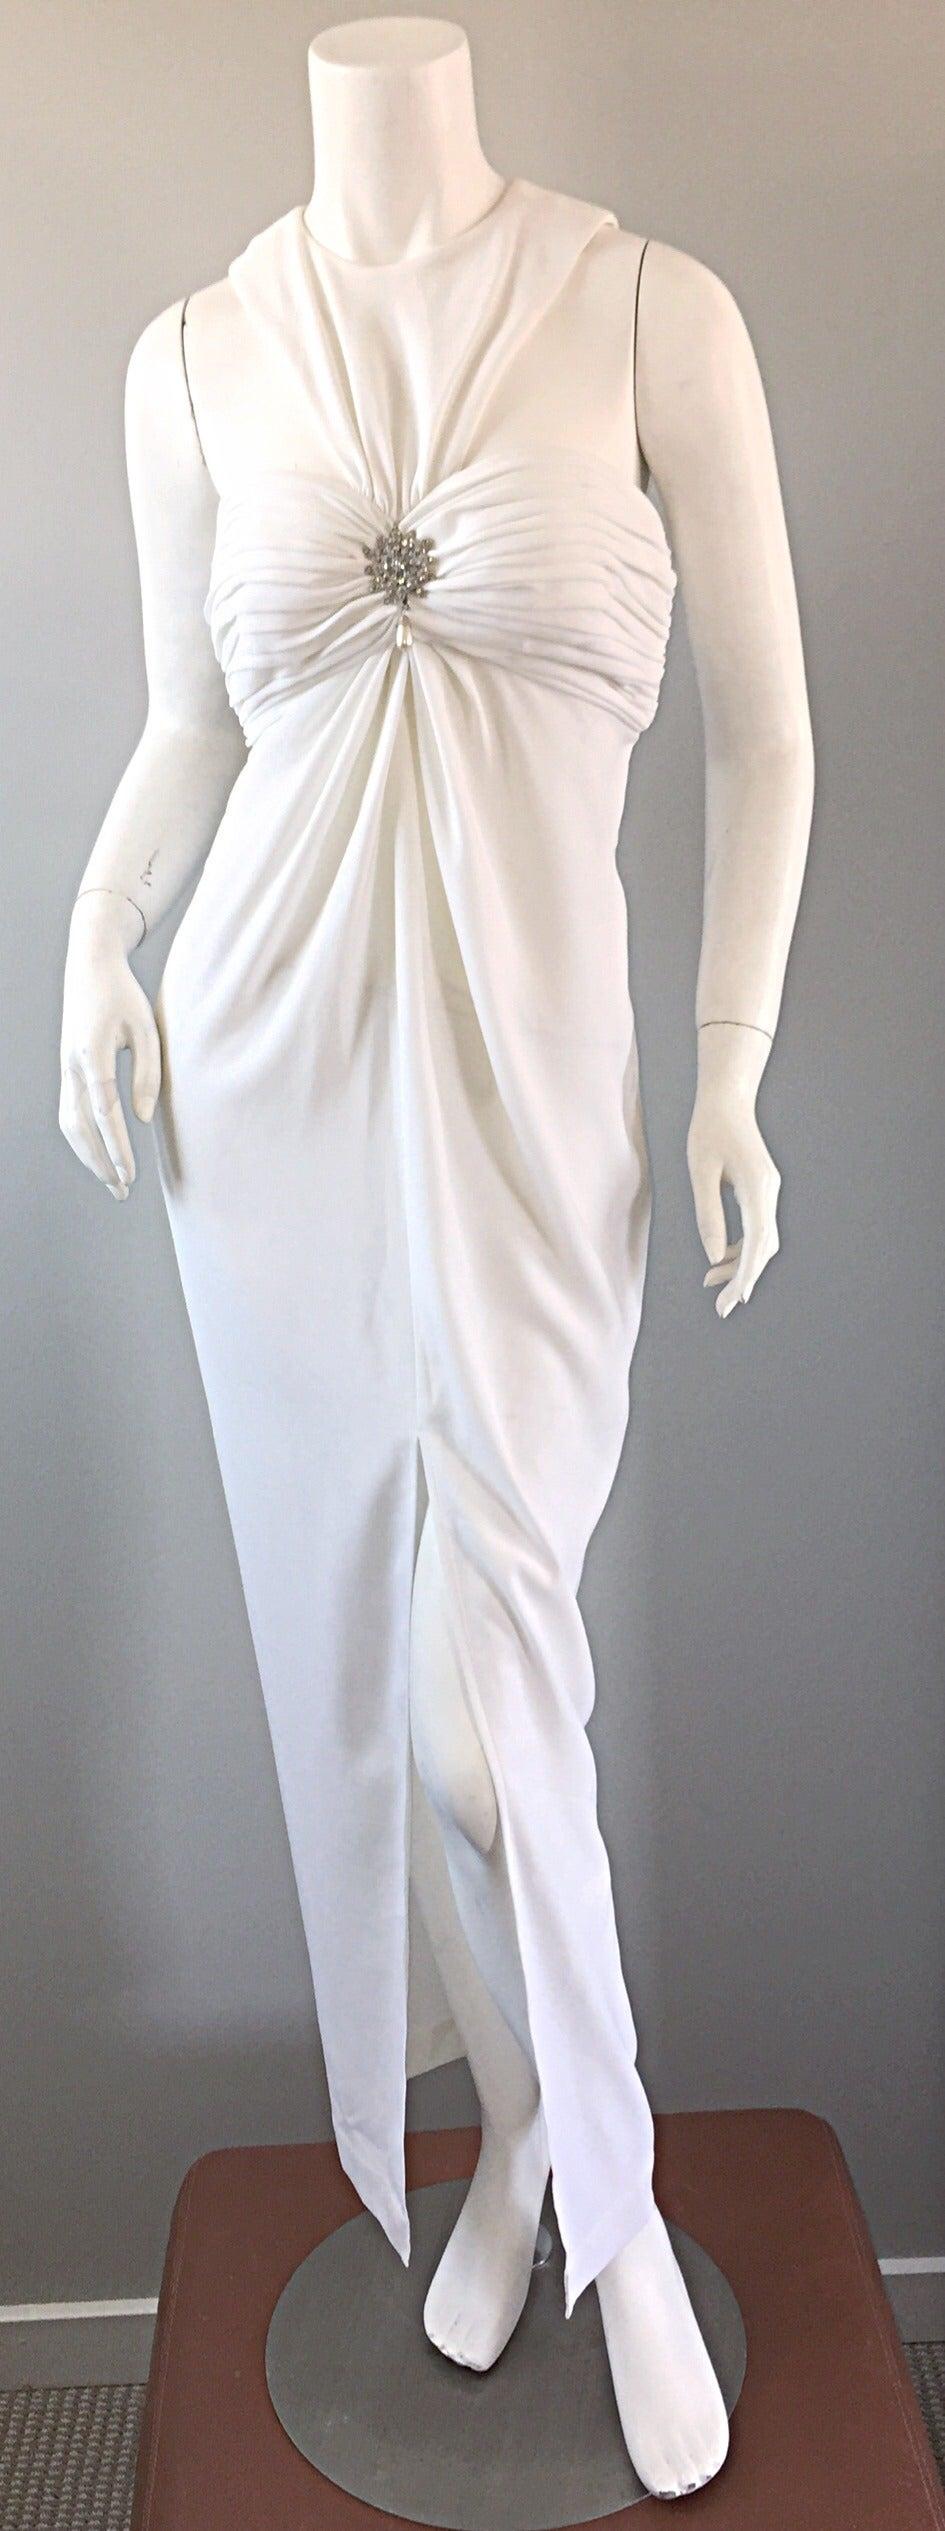 1990s Vintage Tadashi Shoji White 90s Grecian Dress w/ Rhinestones + Pearl For Sale 4